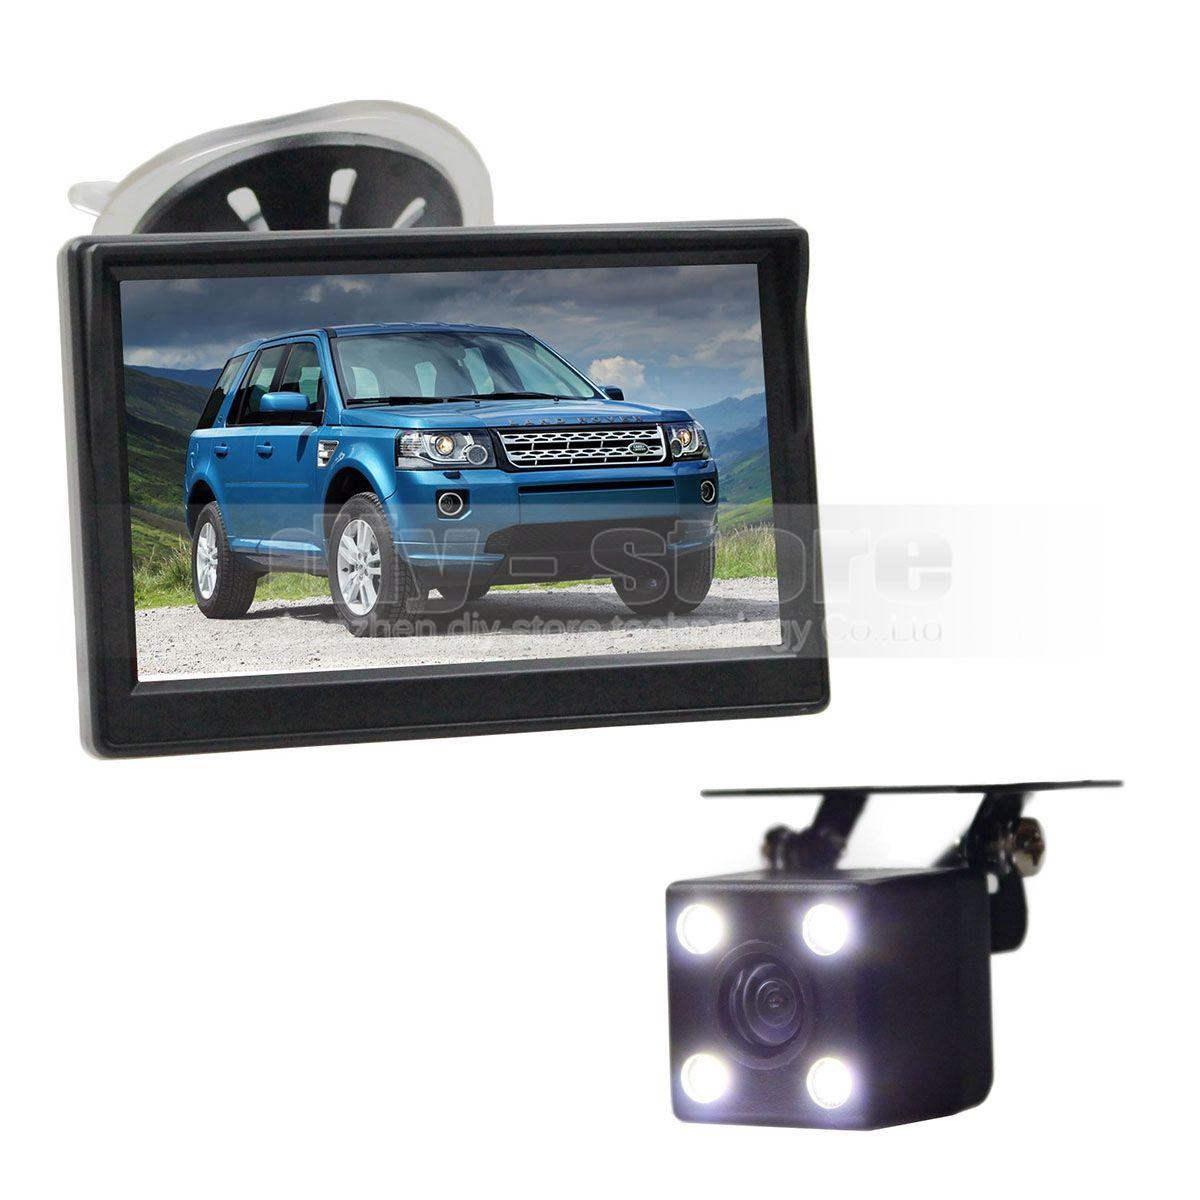 2018 5inch rear view car monitor wire waterproof reverse backup rh dhgate com